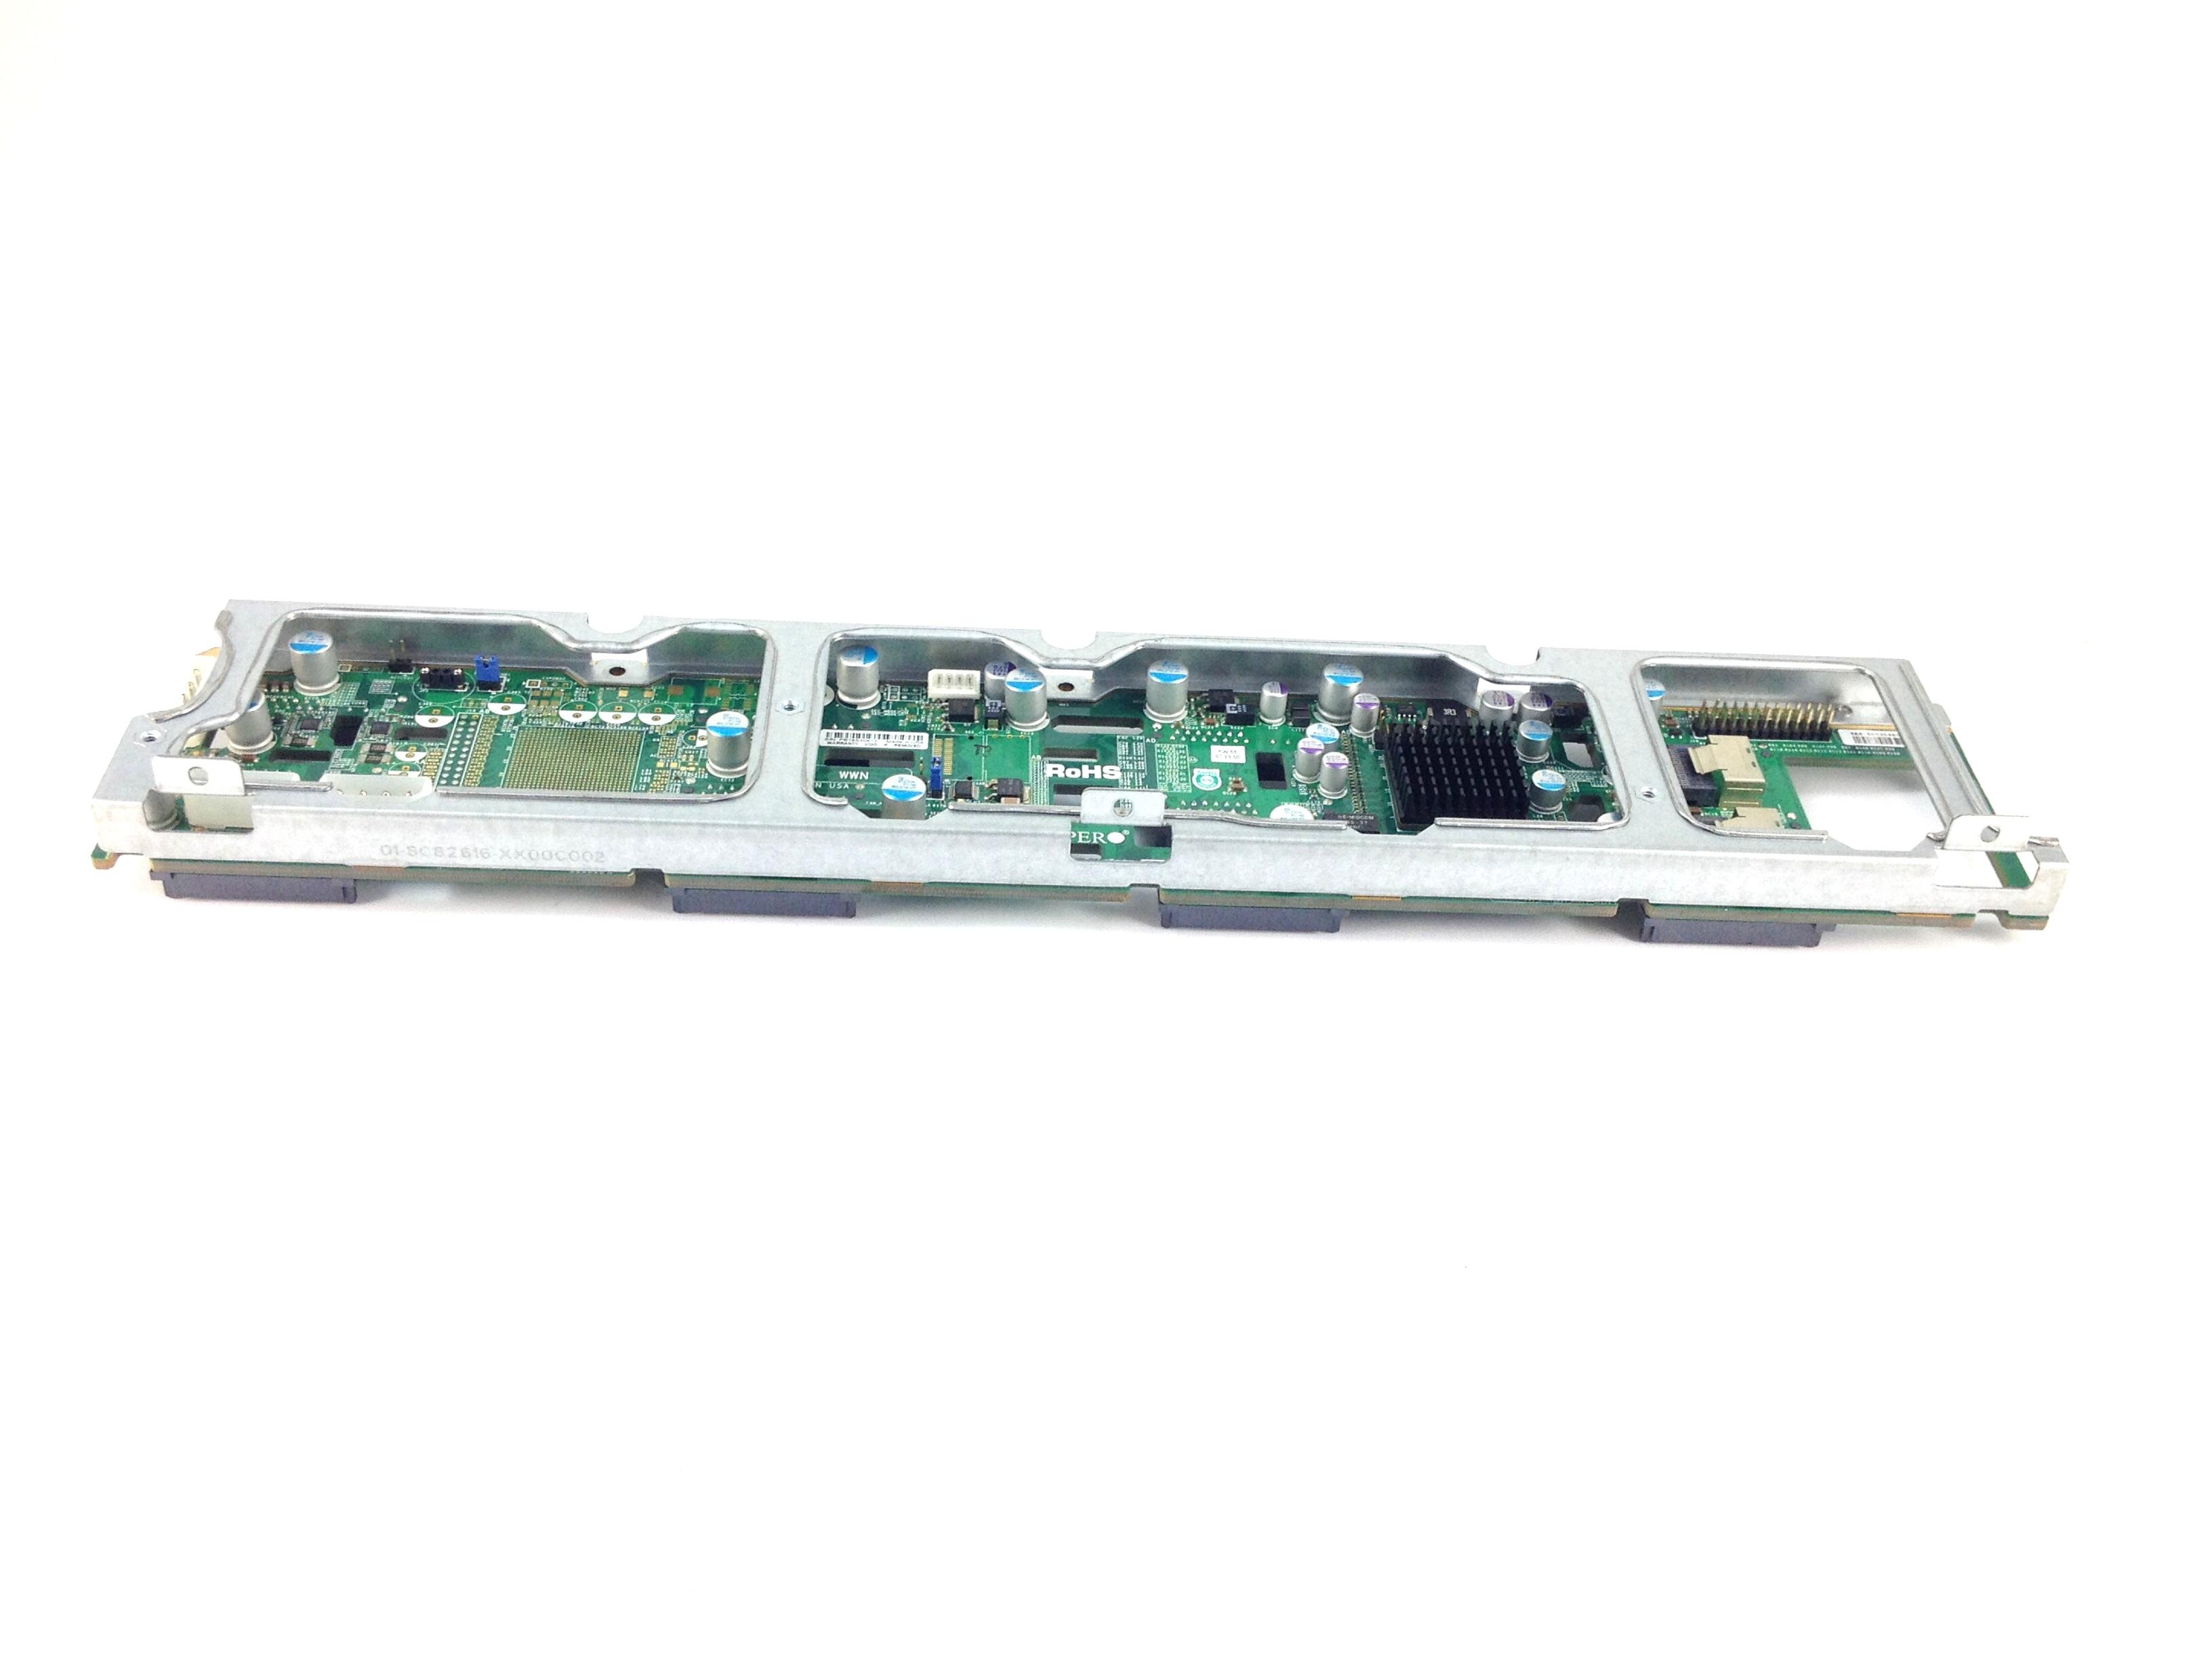 Supermicro 2U 12 Bay SAS / SATA 3.5'' HDD Backplane for 6027R (BPN-SAS2-826EL1)